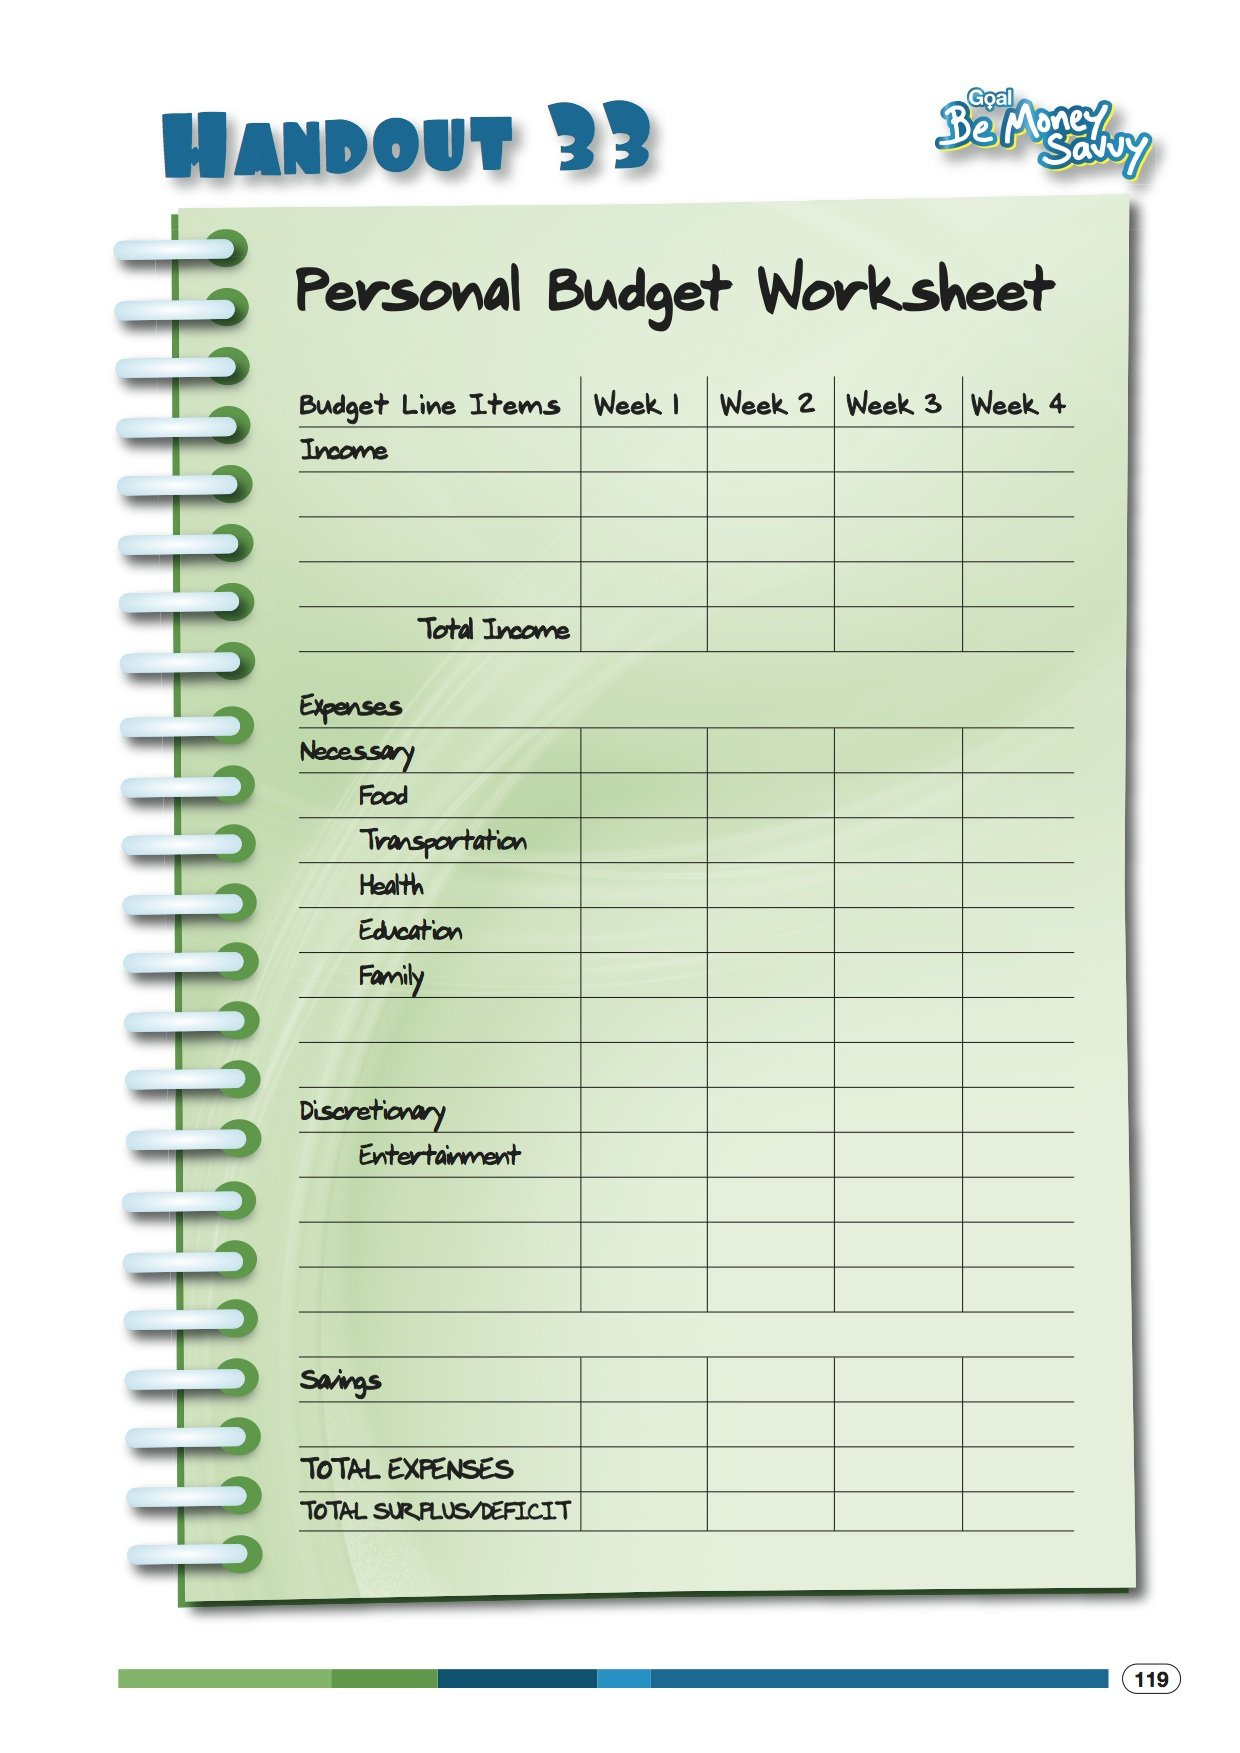 Personal Budget Worksheet — excelguider.com